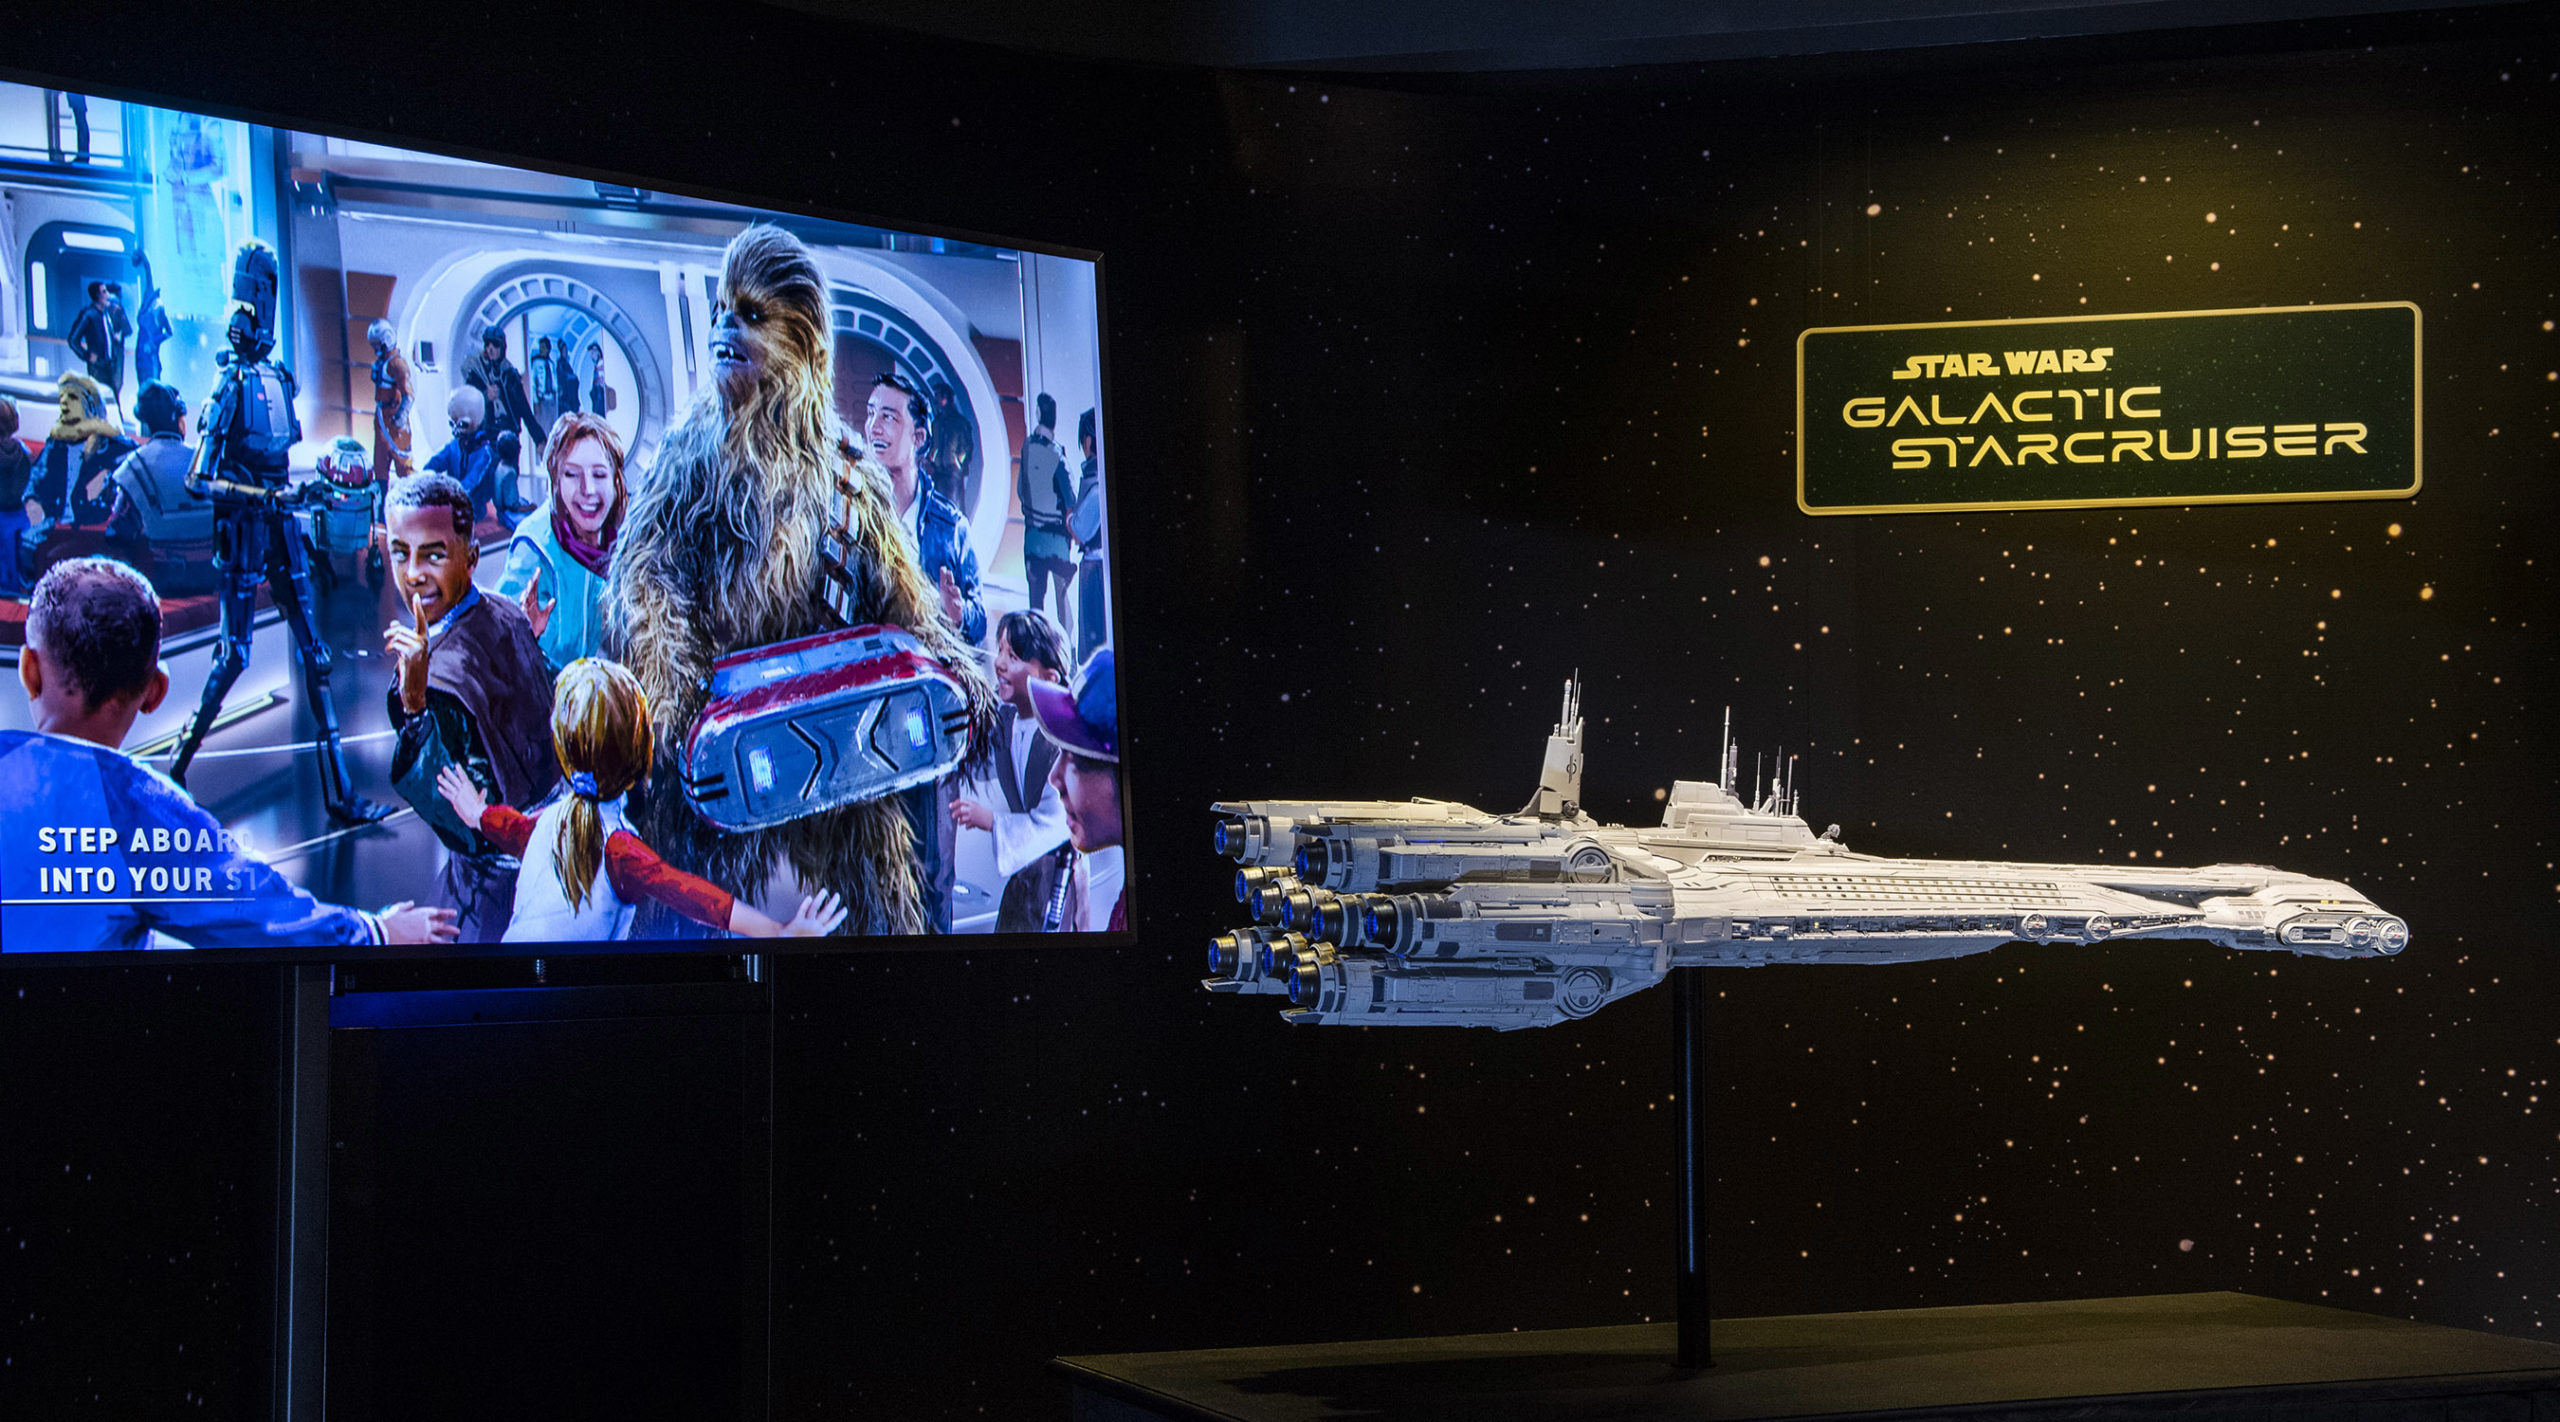 Star Wars Galactic Starcruiser at Walt Disney Presents